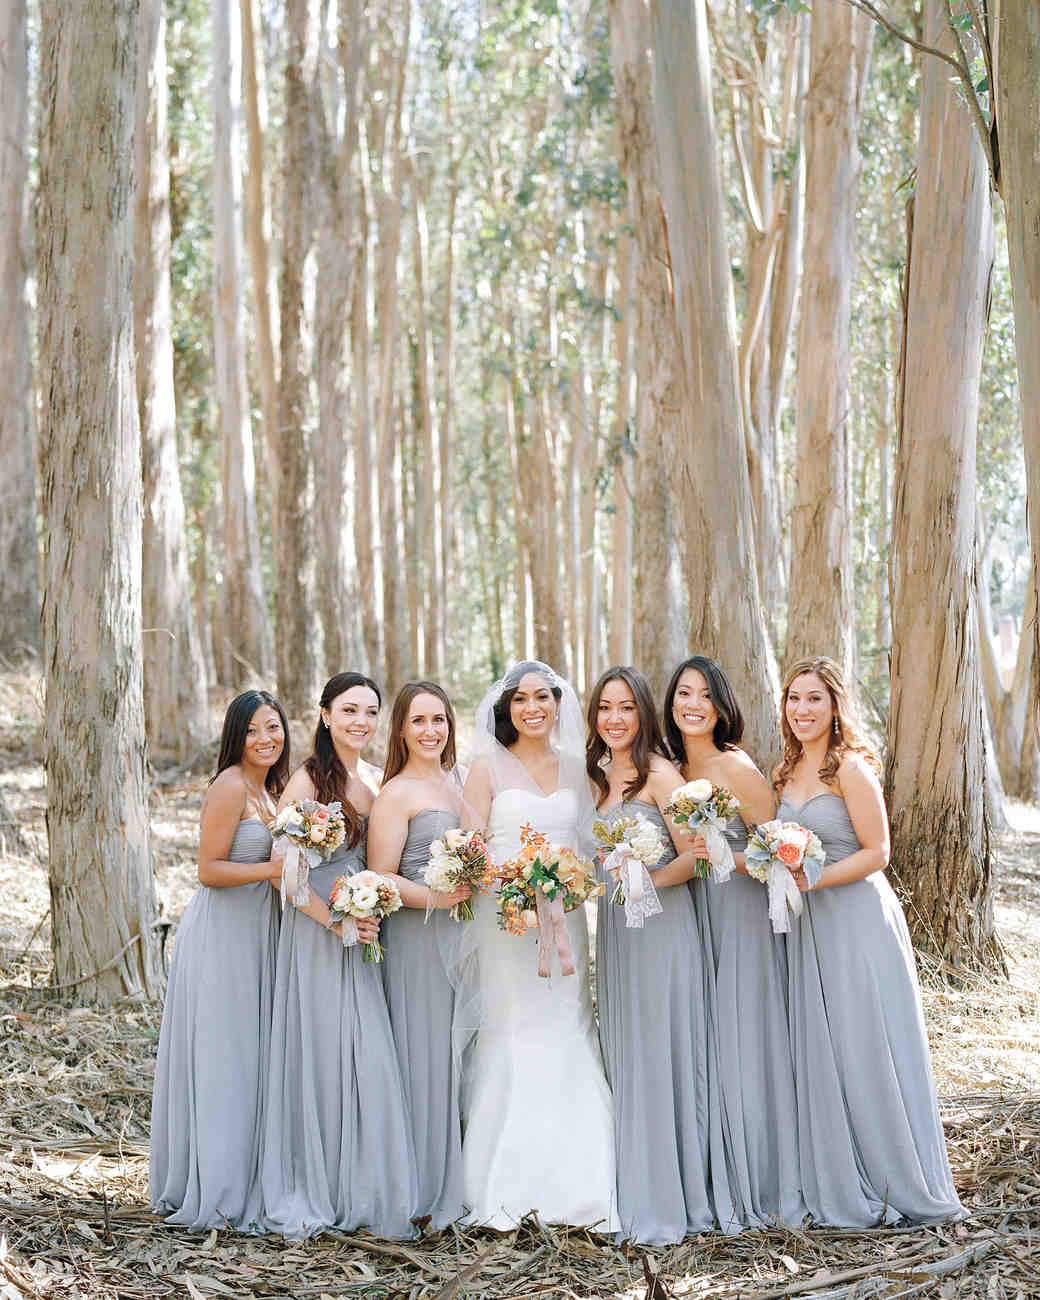 bride-bridesmaids-elizabeth-messina-007-mwds110806.jpg